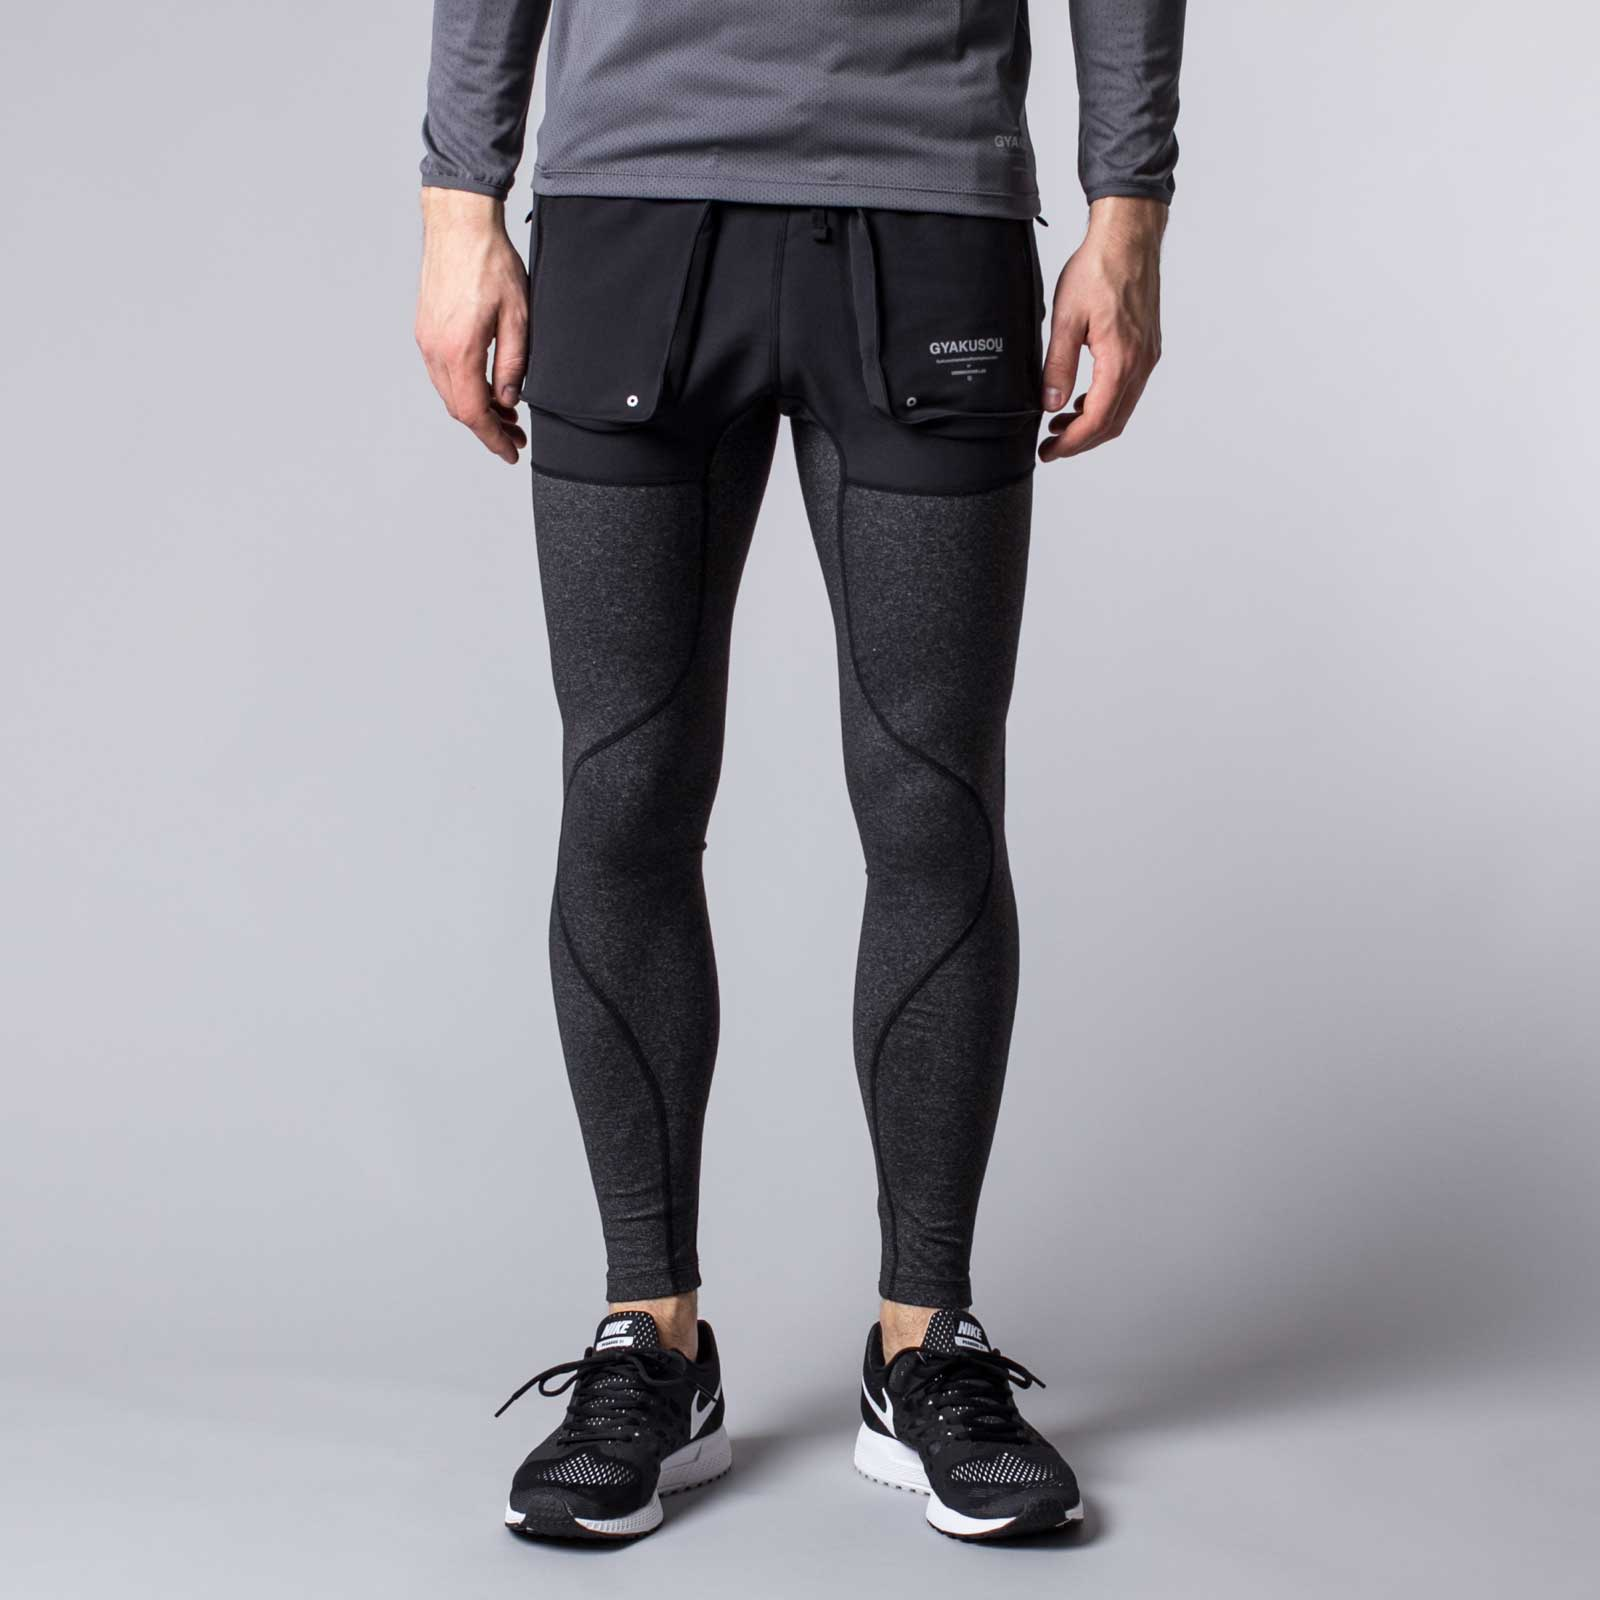 Nike AS Gyakusou Utility Long Tights - 658485-010 - Sneakersnstuff ... 2bcd0d6bf